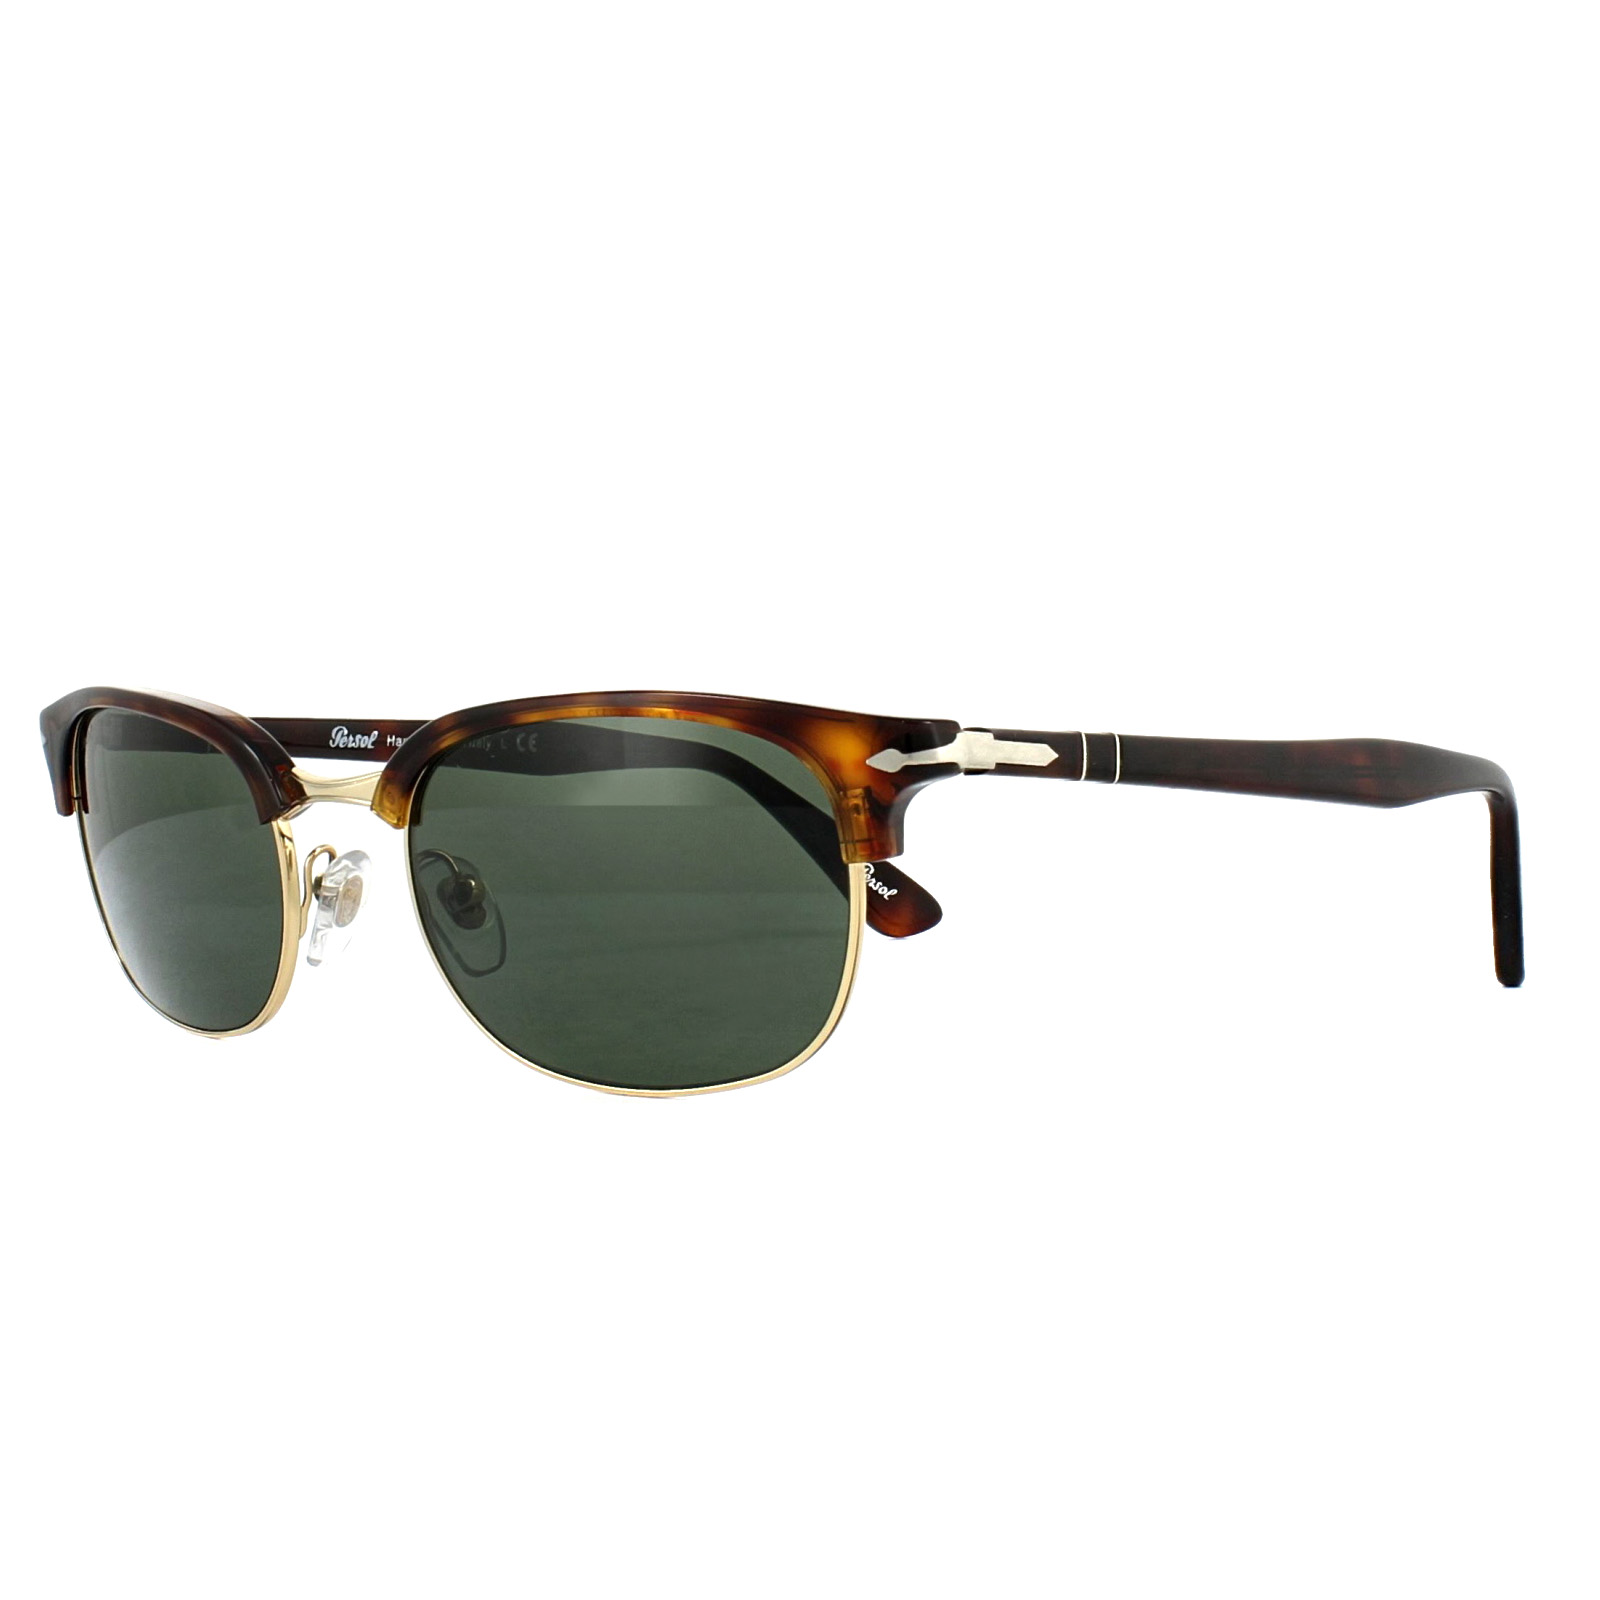 Persol Sunglasses 8139S 24 31 Havana Green 8053672547504   eBay 2ceb617866